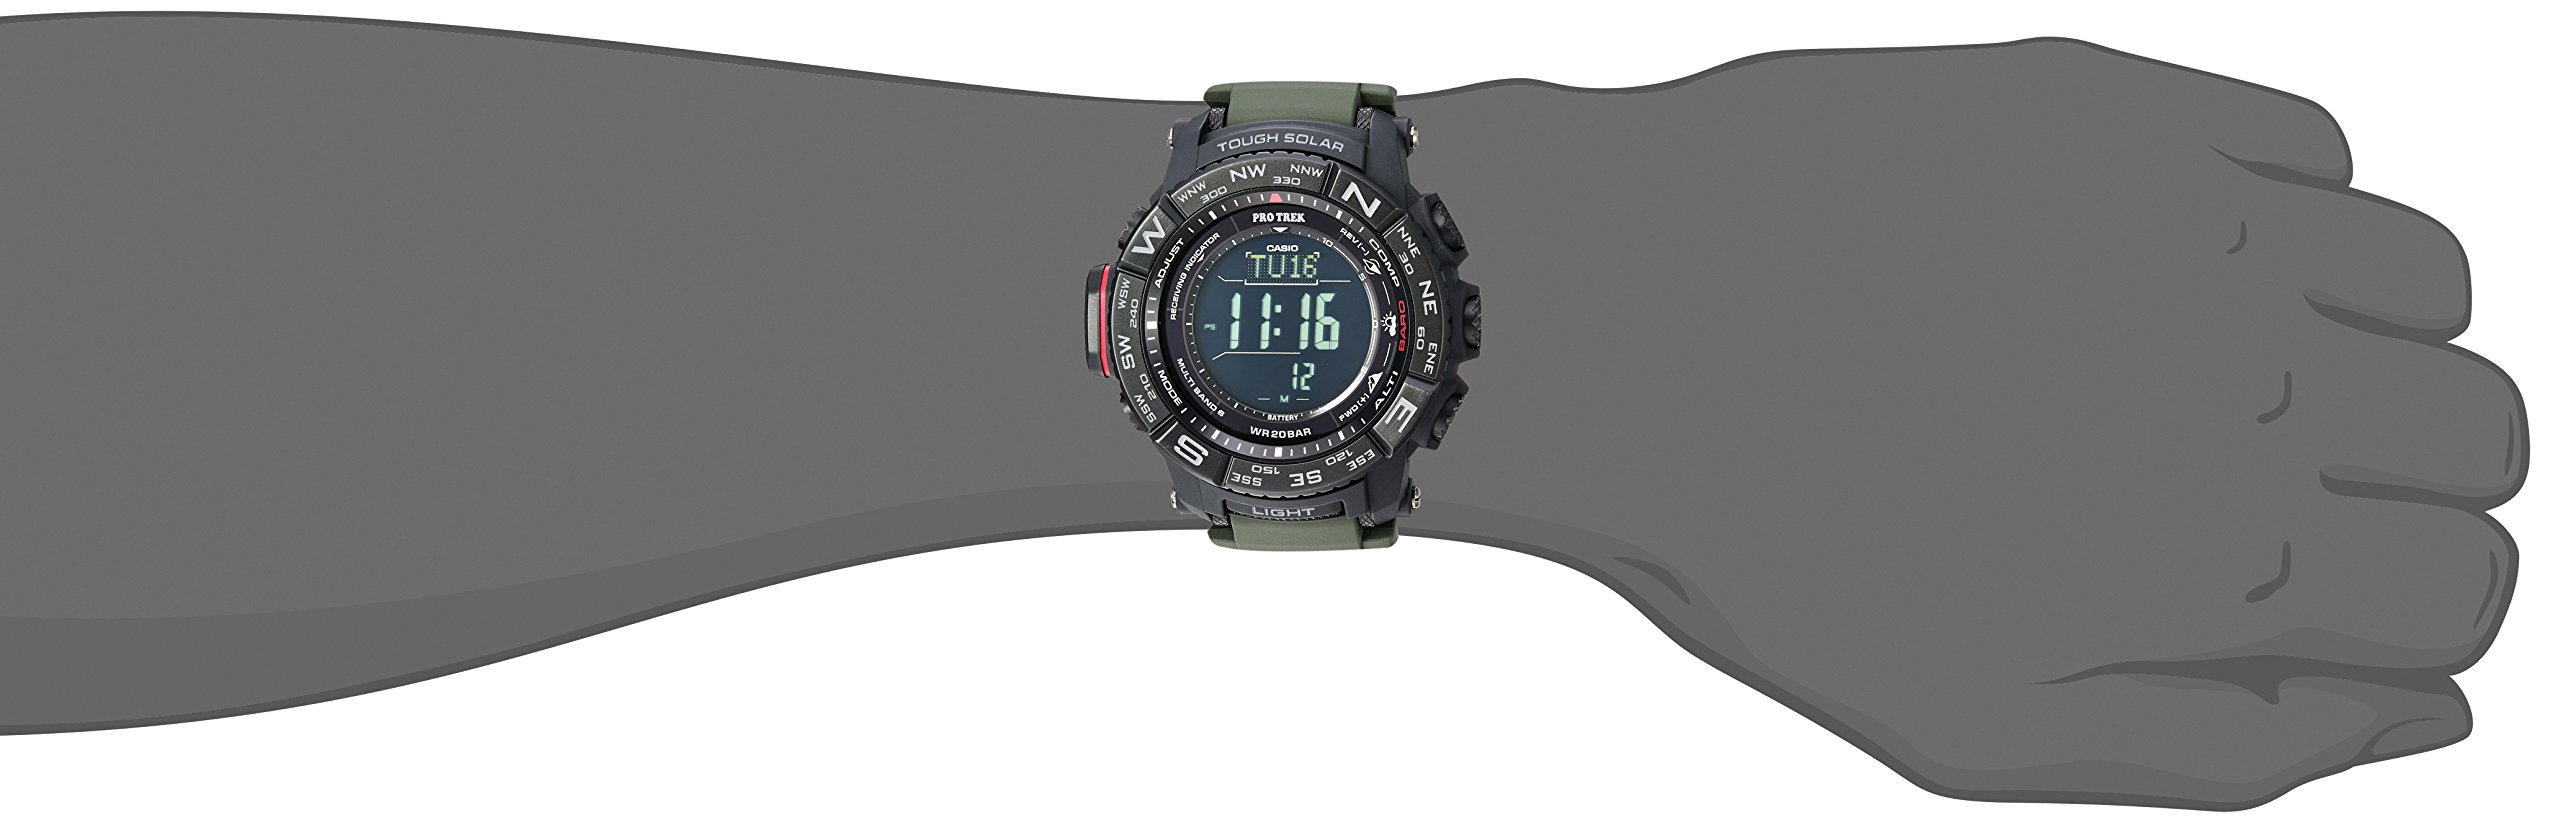 Casio Men's Pro Trek Stainless Steel Quartz Watch with Resin Strap, Black, 20.2 (Model: PRW-3510Y-8CR) by Casio (Image #2)